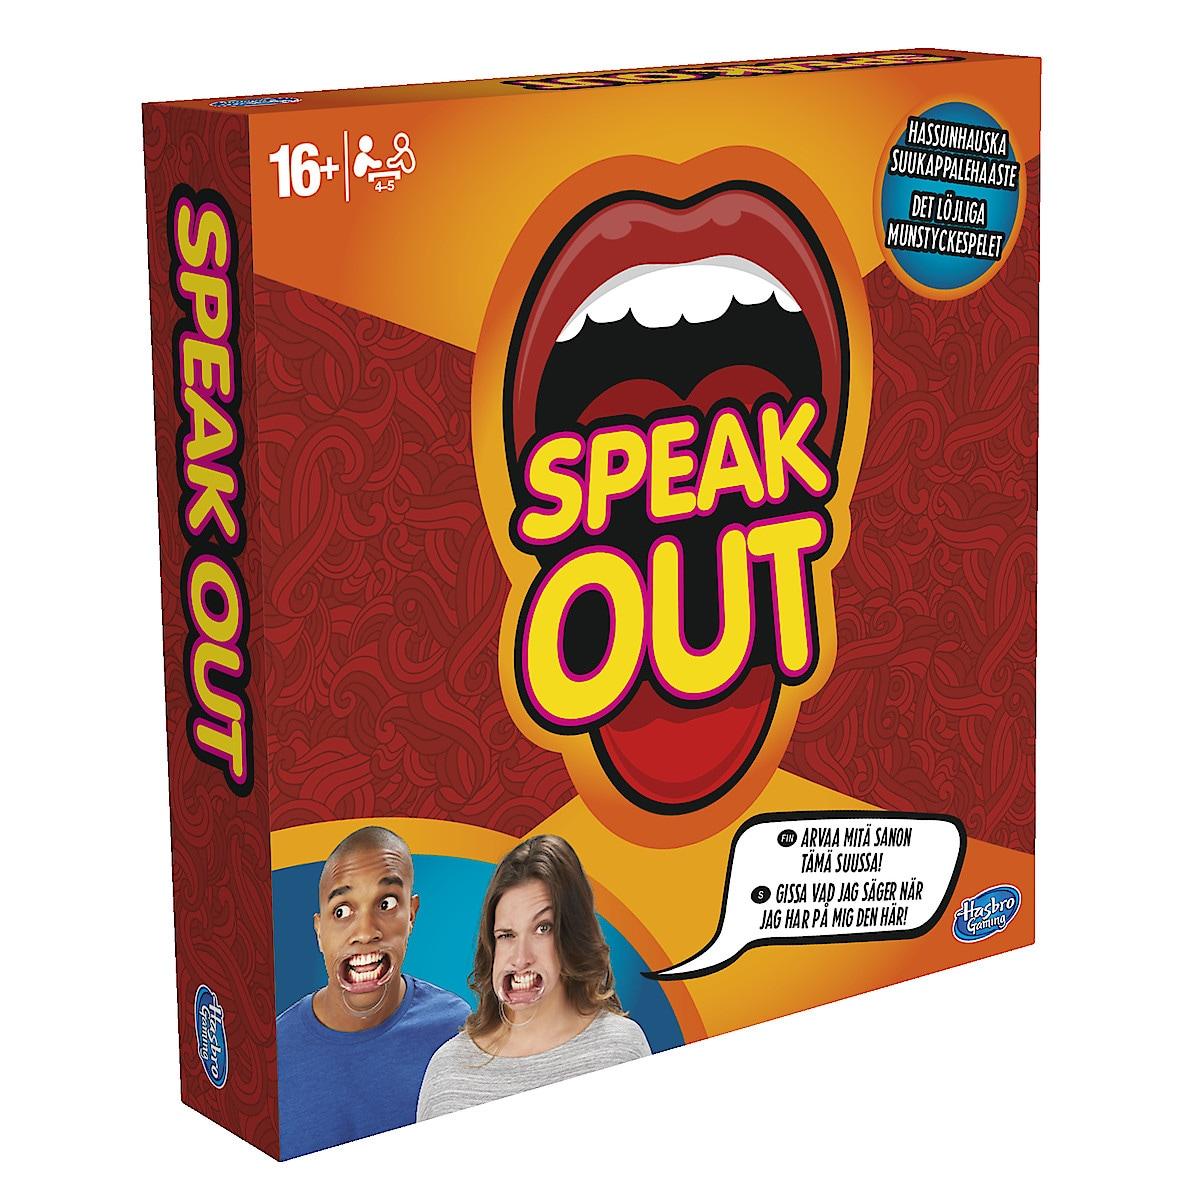 Seurapeli Speak Out, Hasbro